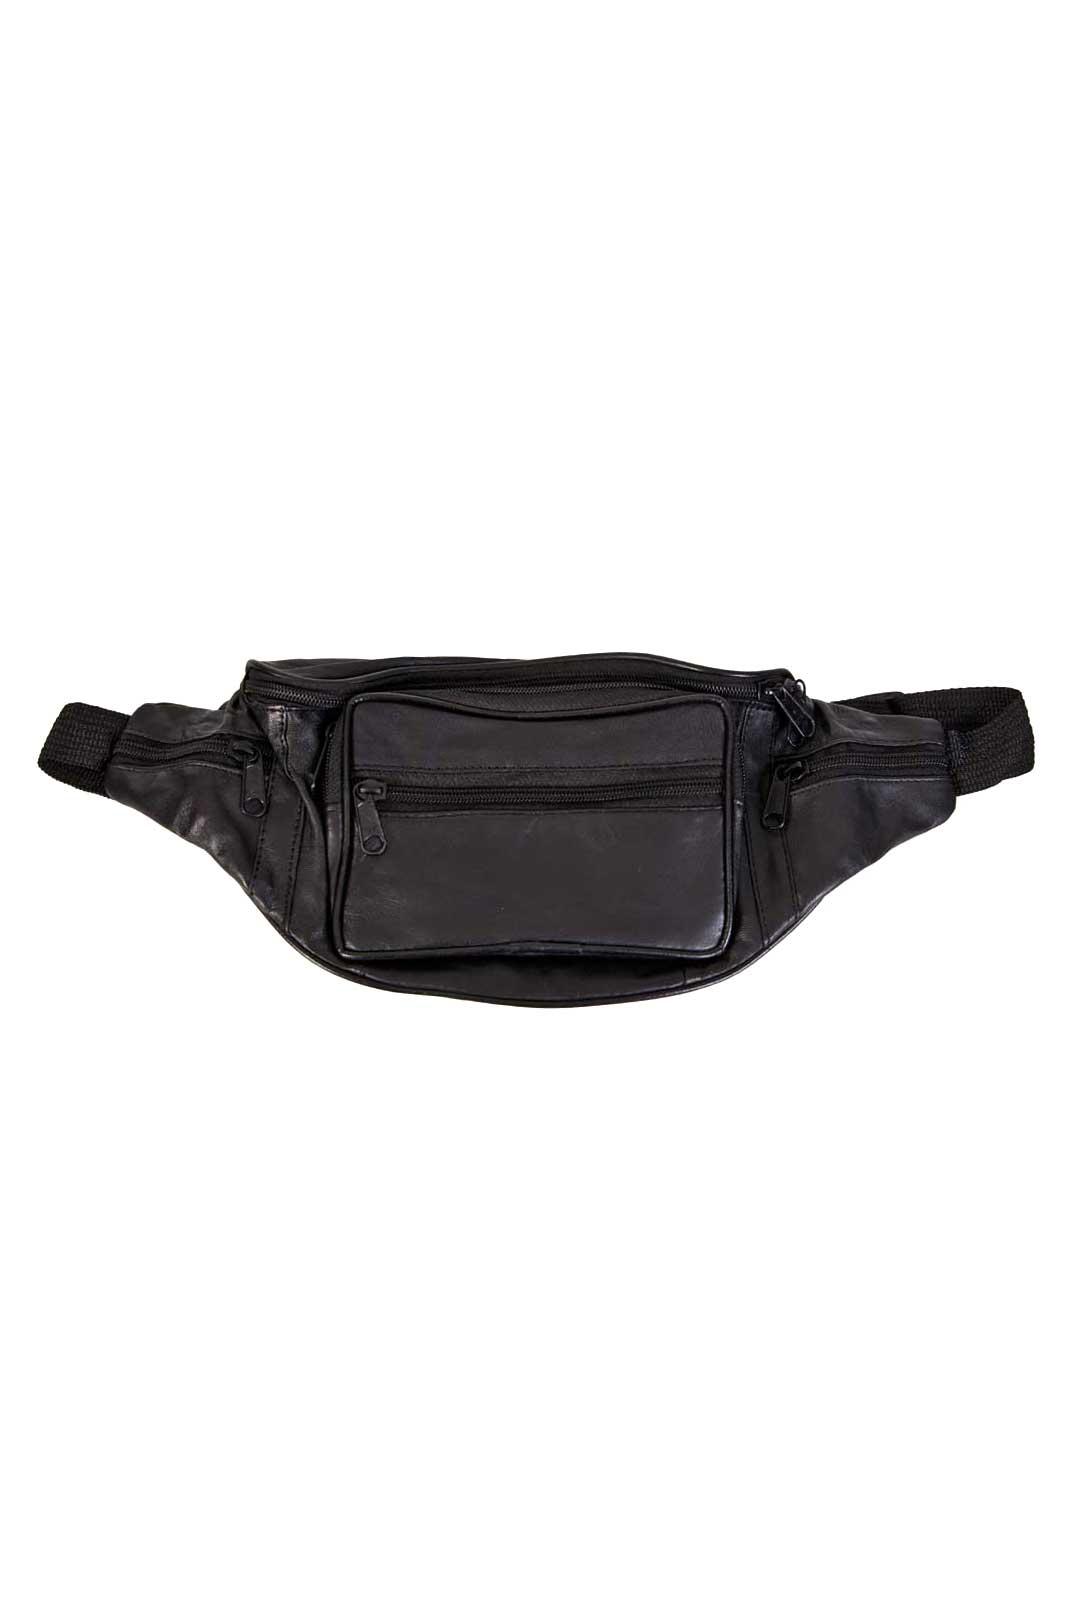 Black Leather Bum Bag